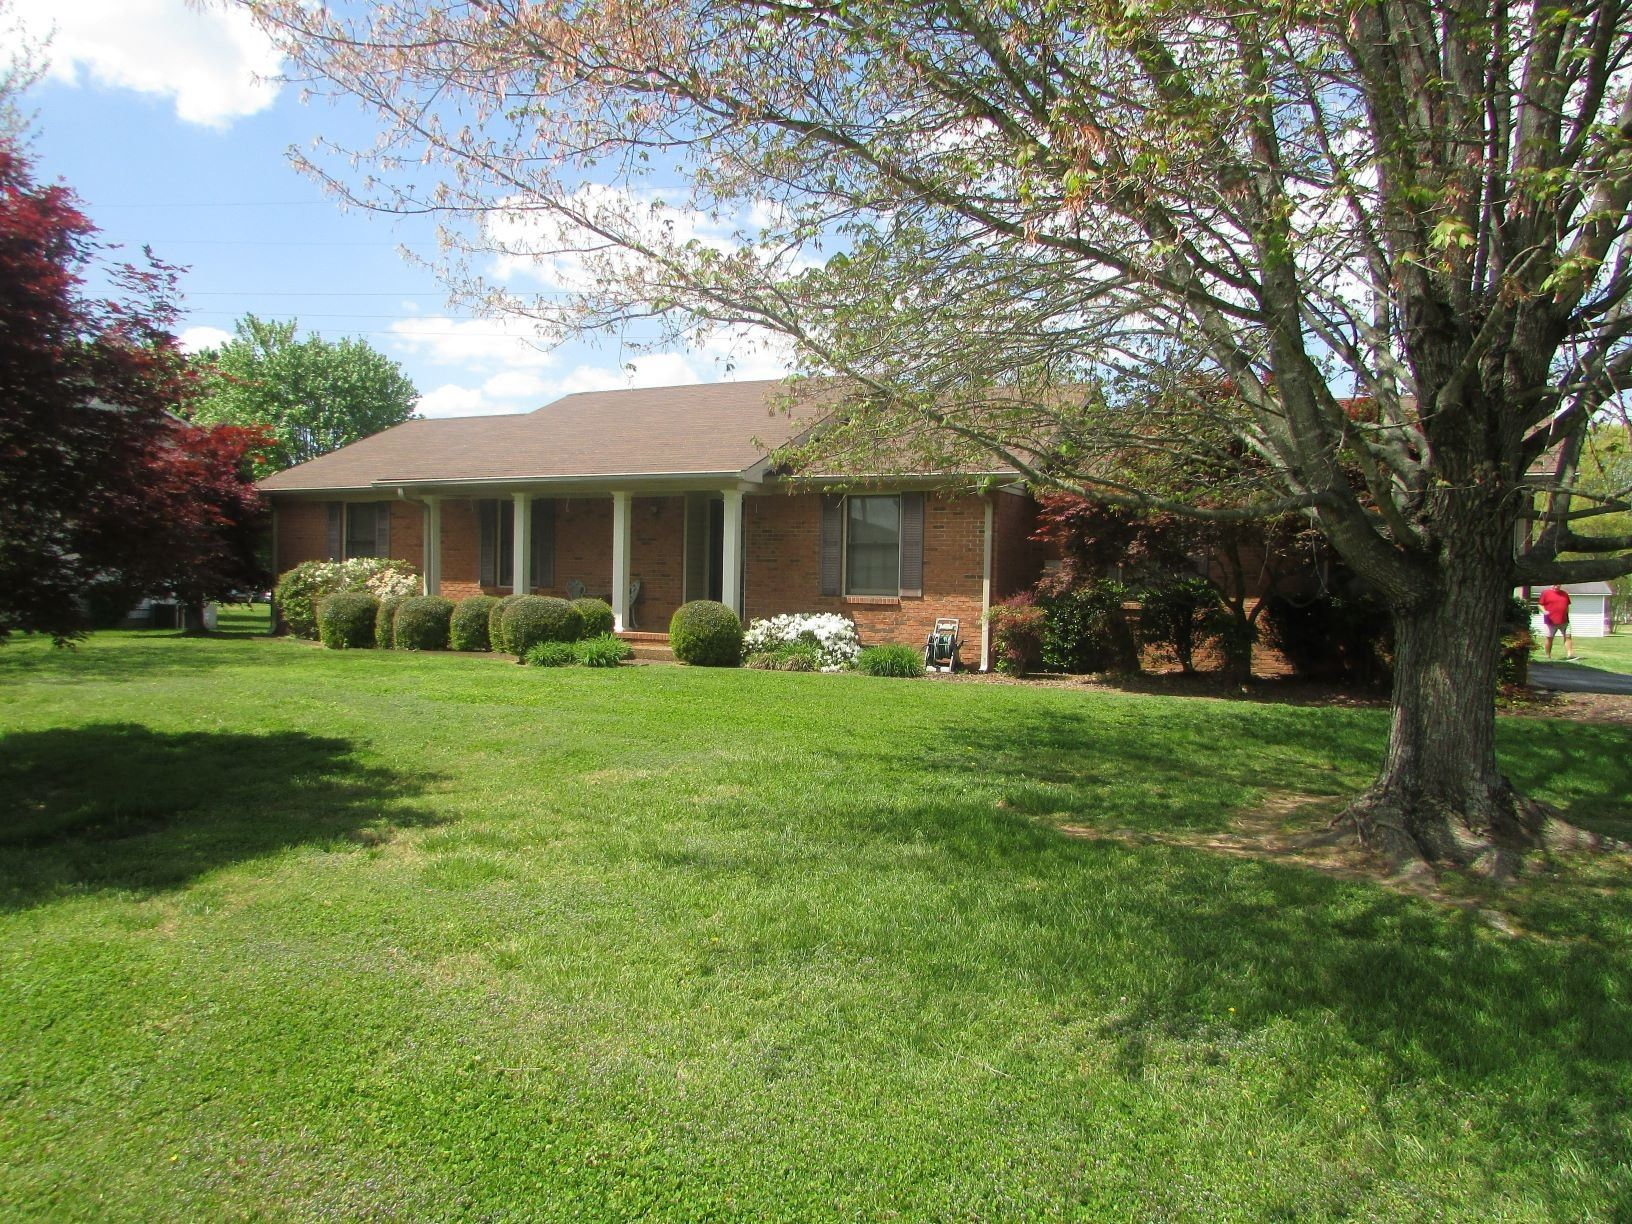 5013 Hays Dr, Columbia, TN 38401 - MLS#: 2251821